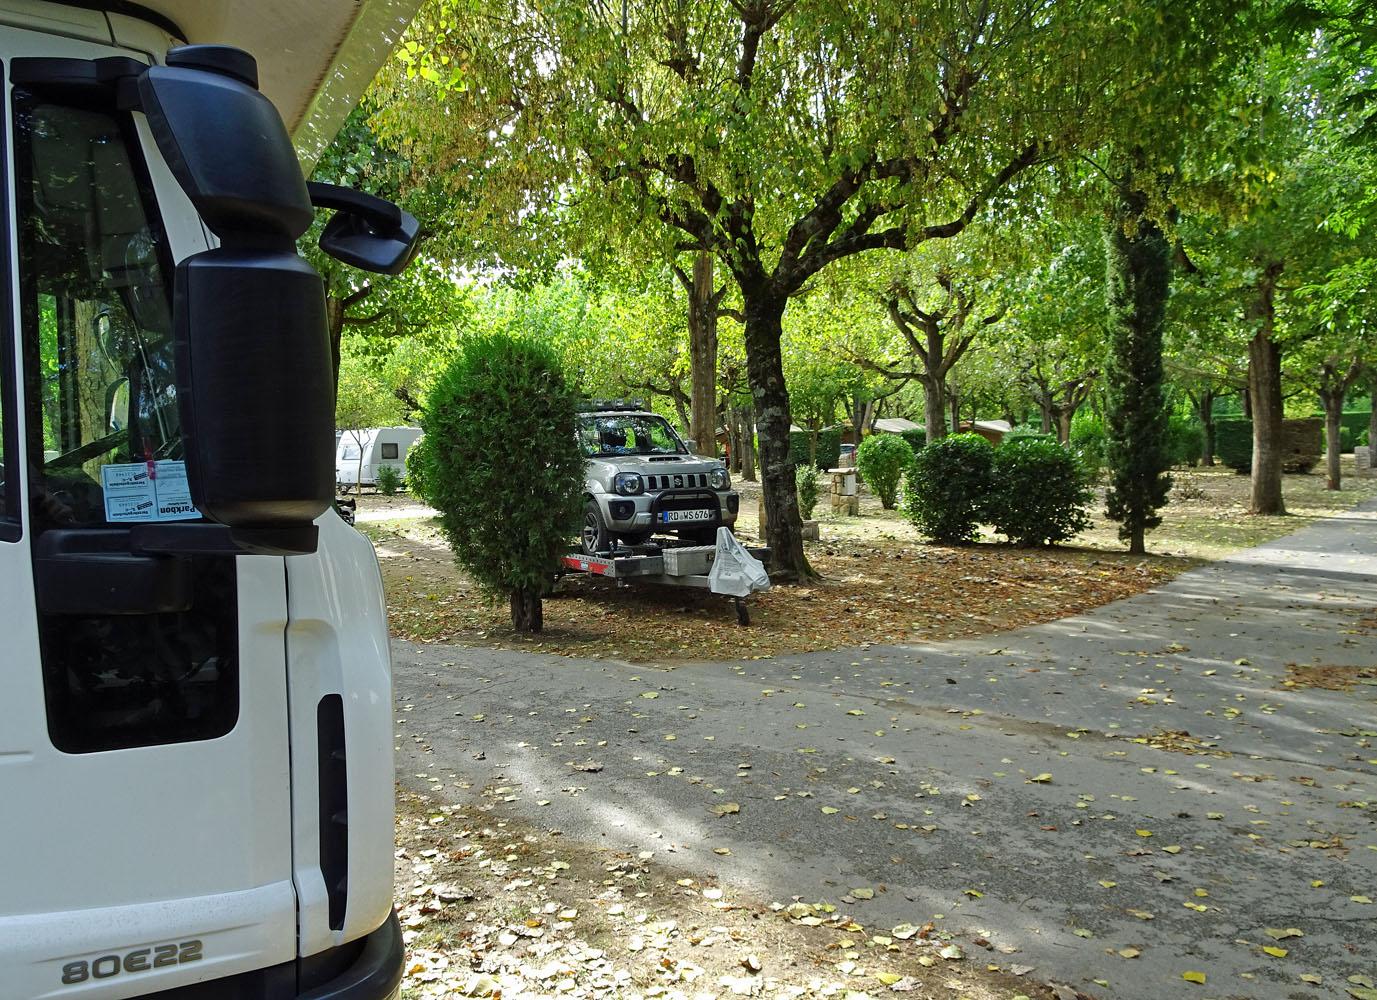 bergziege-auf-trailer-whe